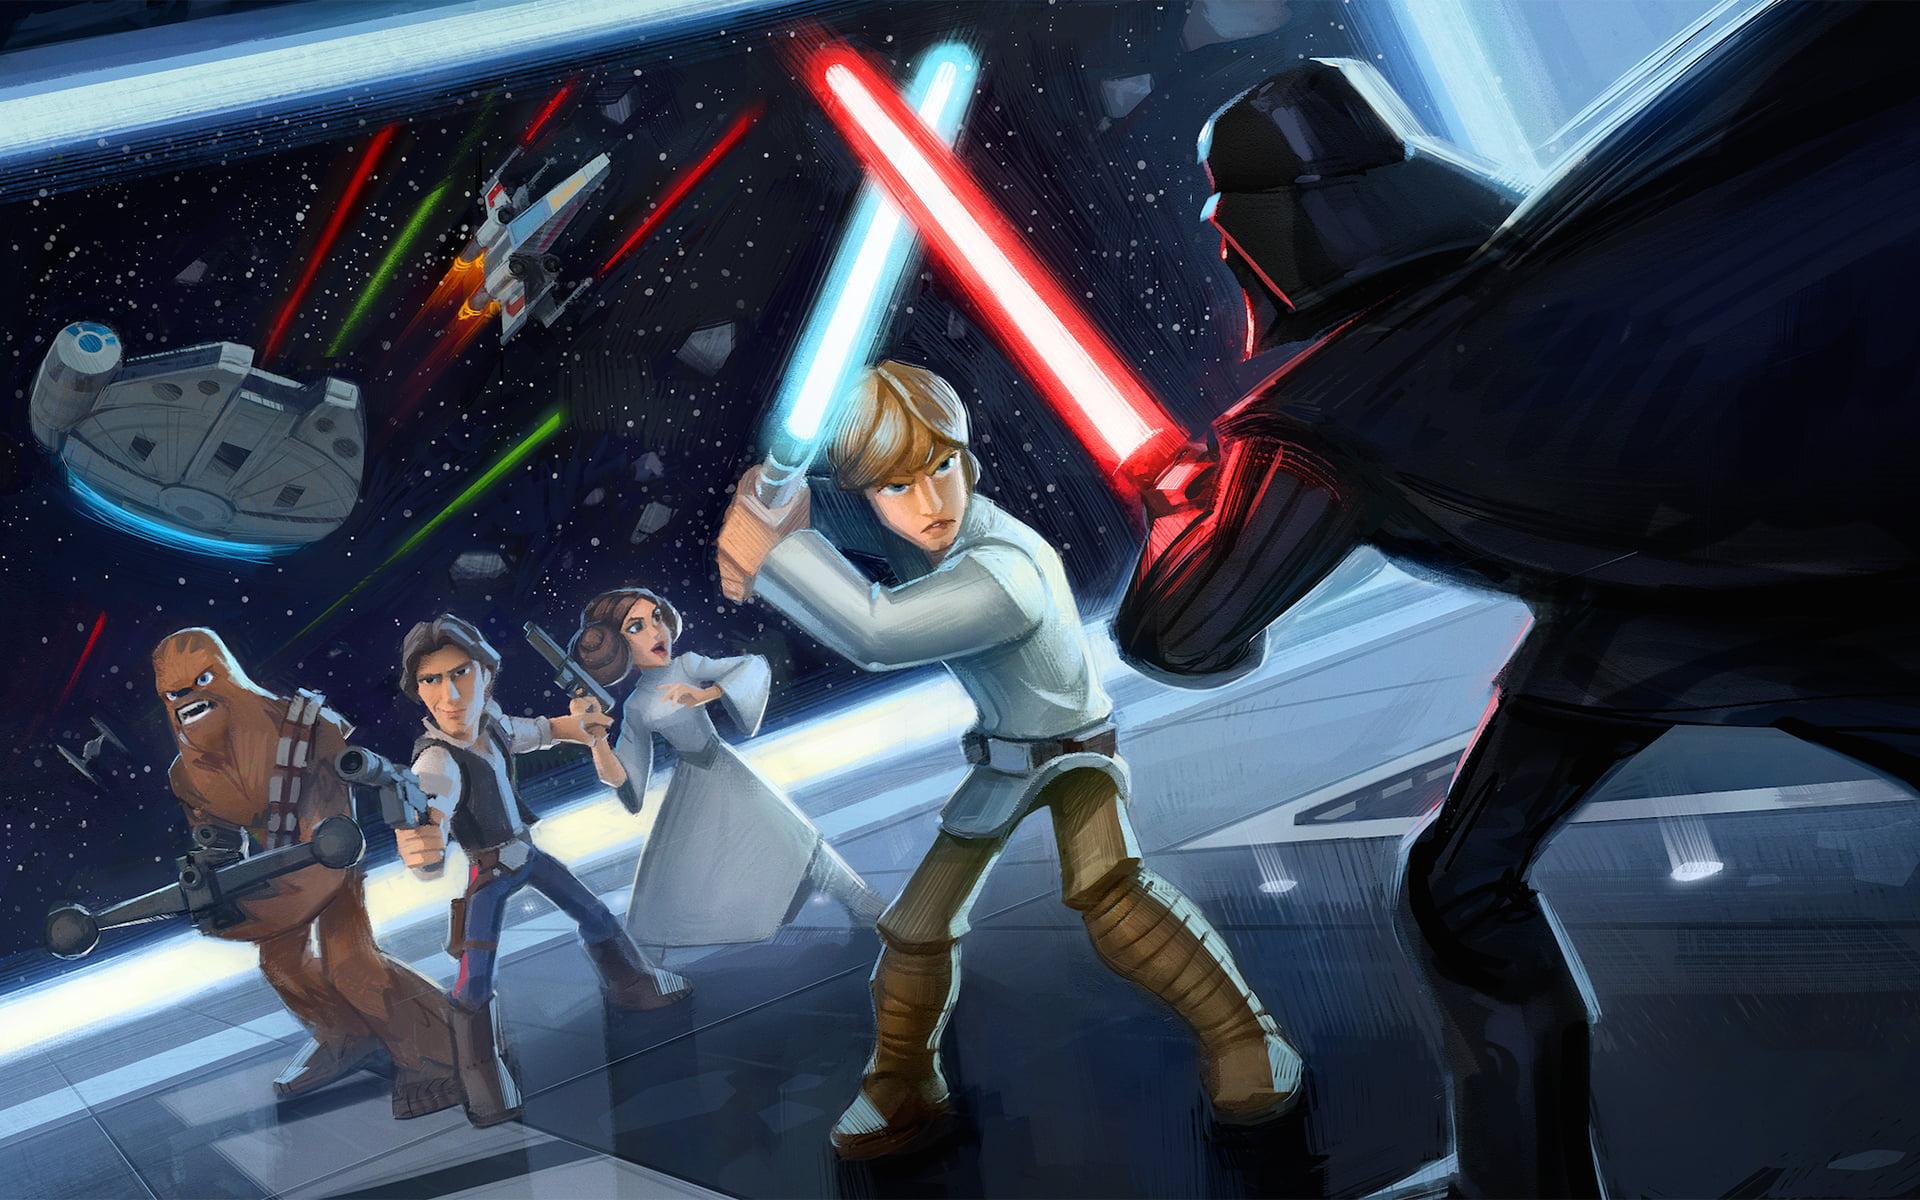 Luke Skywalker Vs Darth Vader Epic 1920x1200 Wallpaper Teahub Io